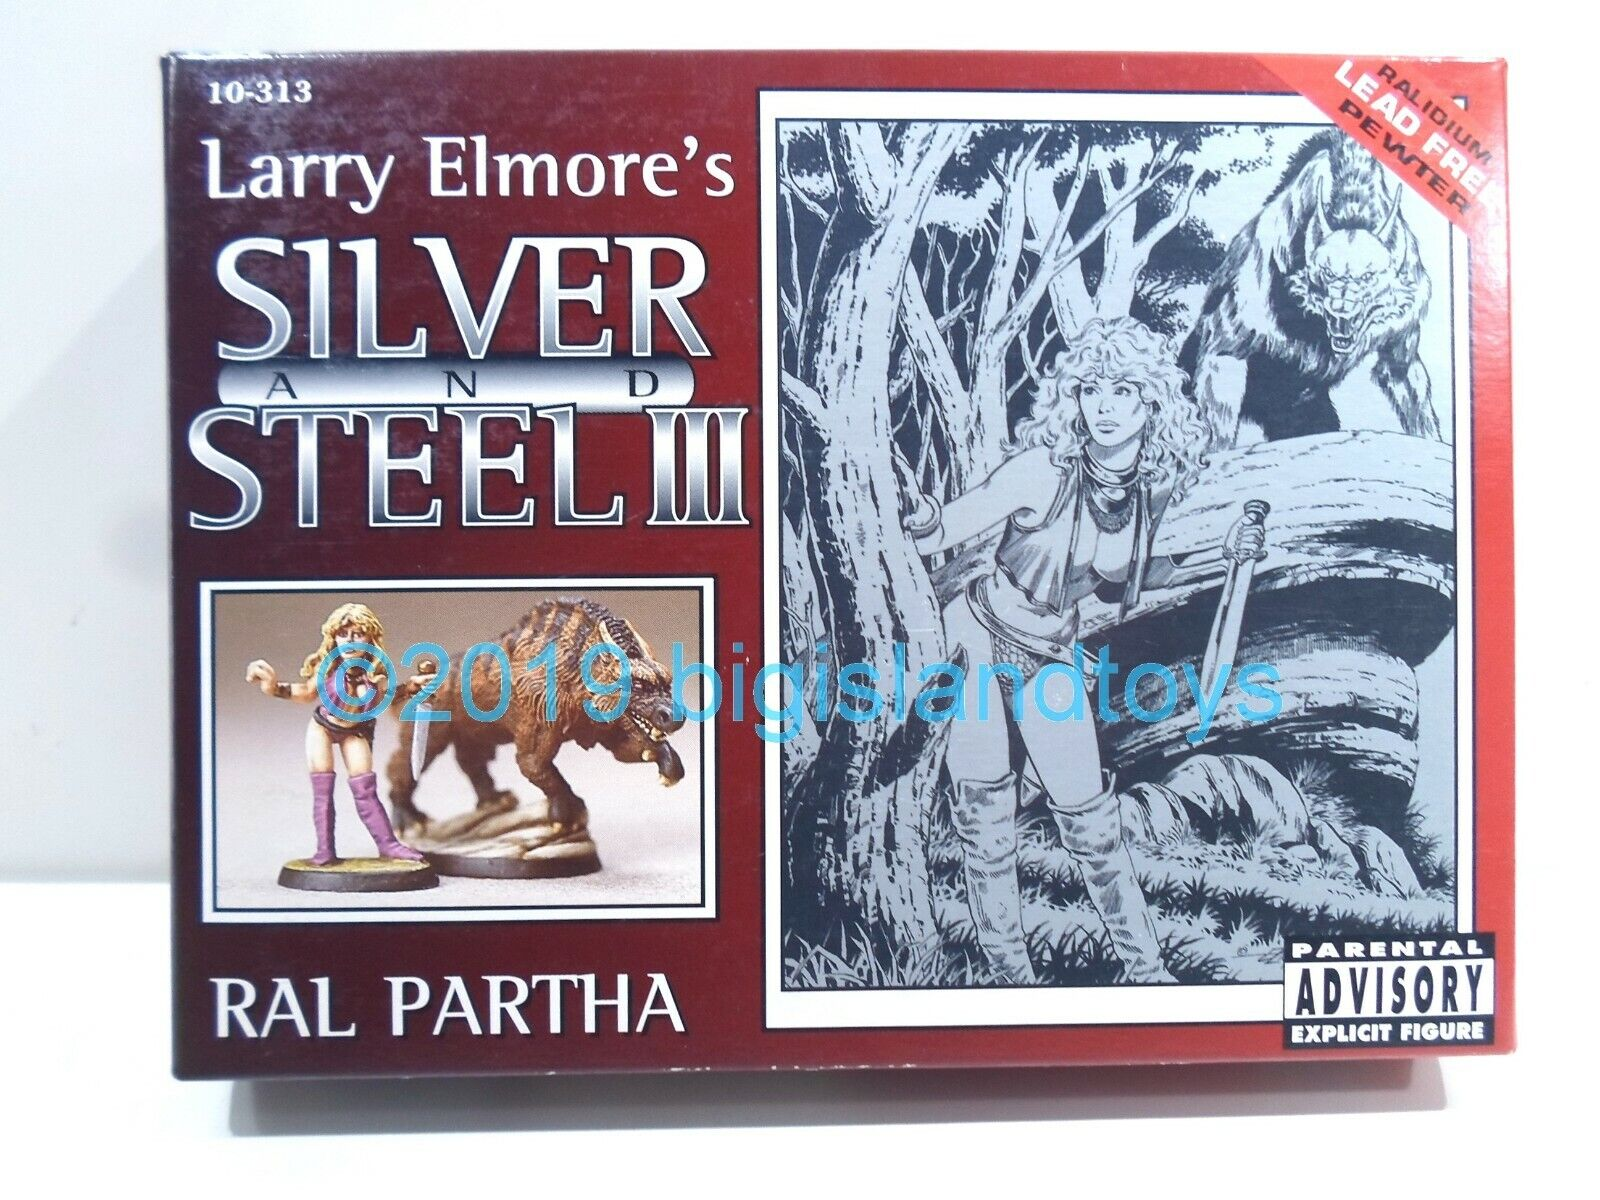 RAL Partha miniaturas  10-313 Larry Elmore de plata y acero III